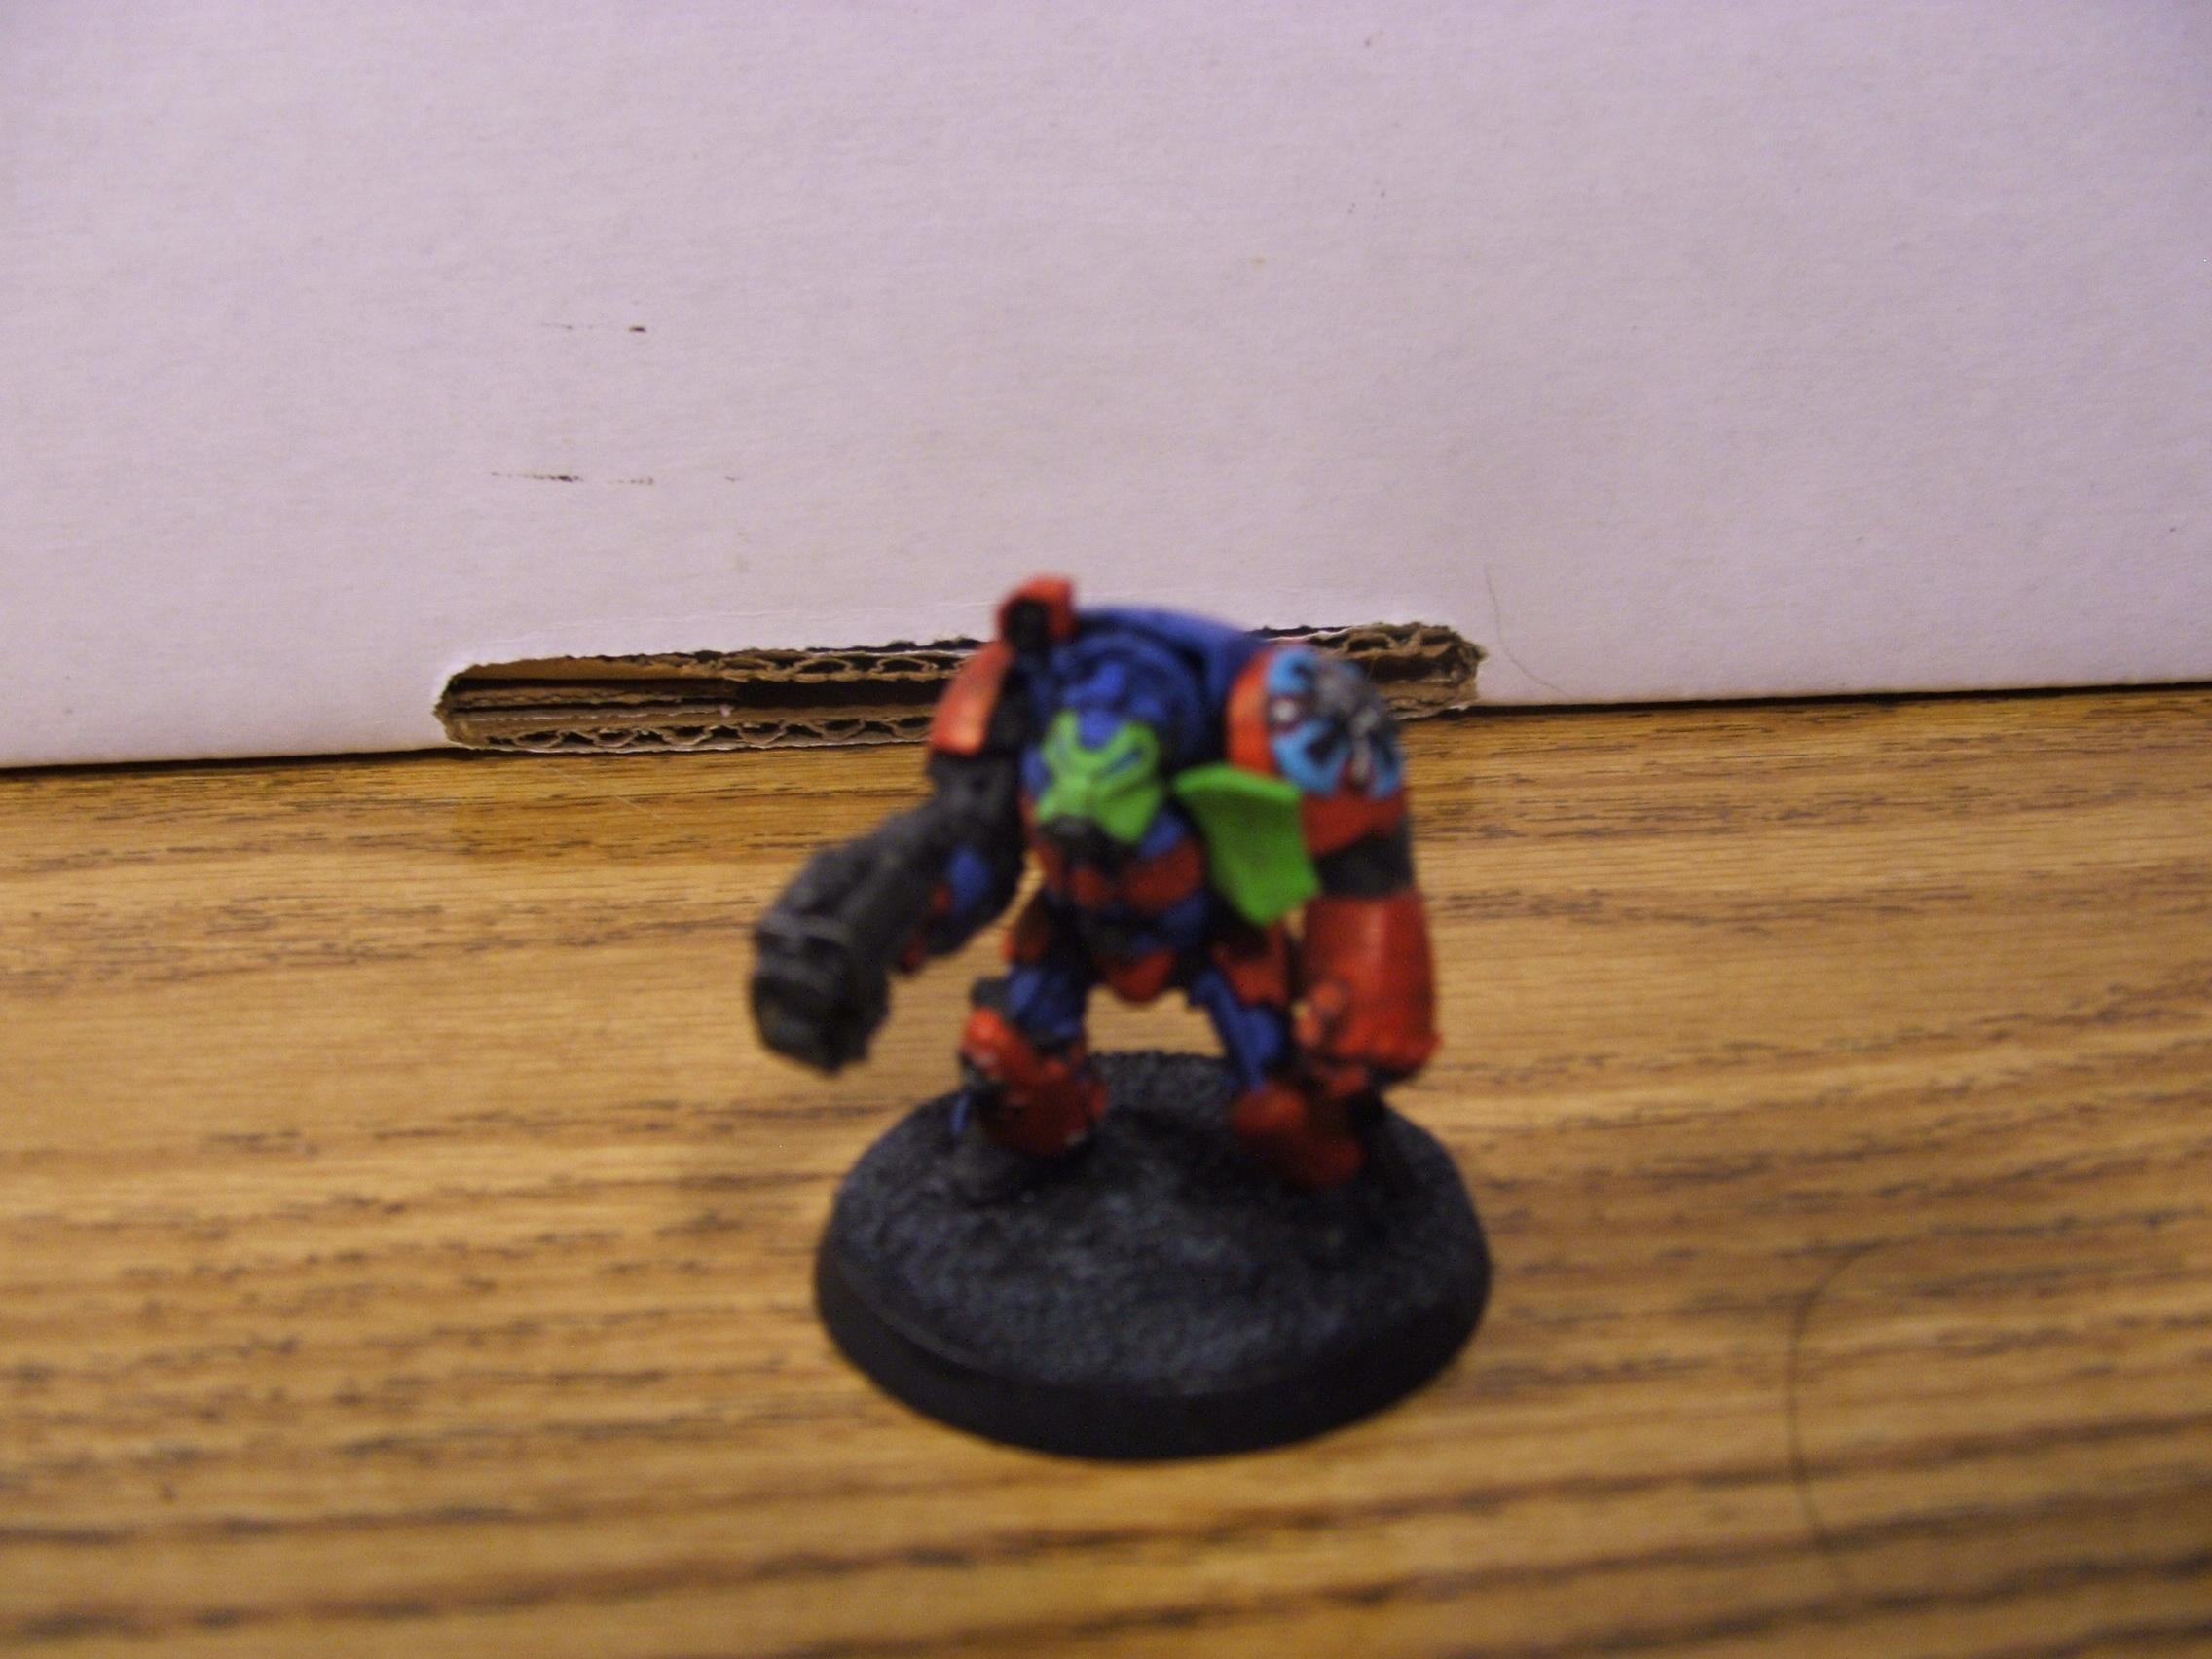 Blurred Photo, Space Marines, Tda, Terminator Armor